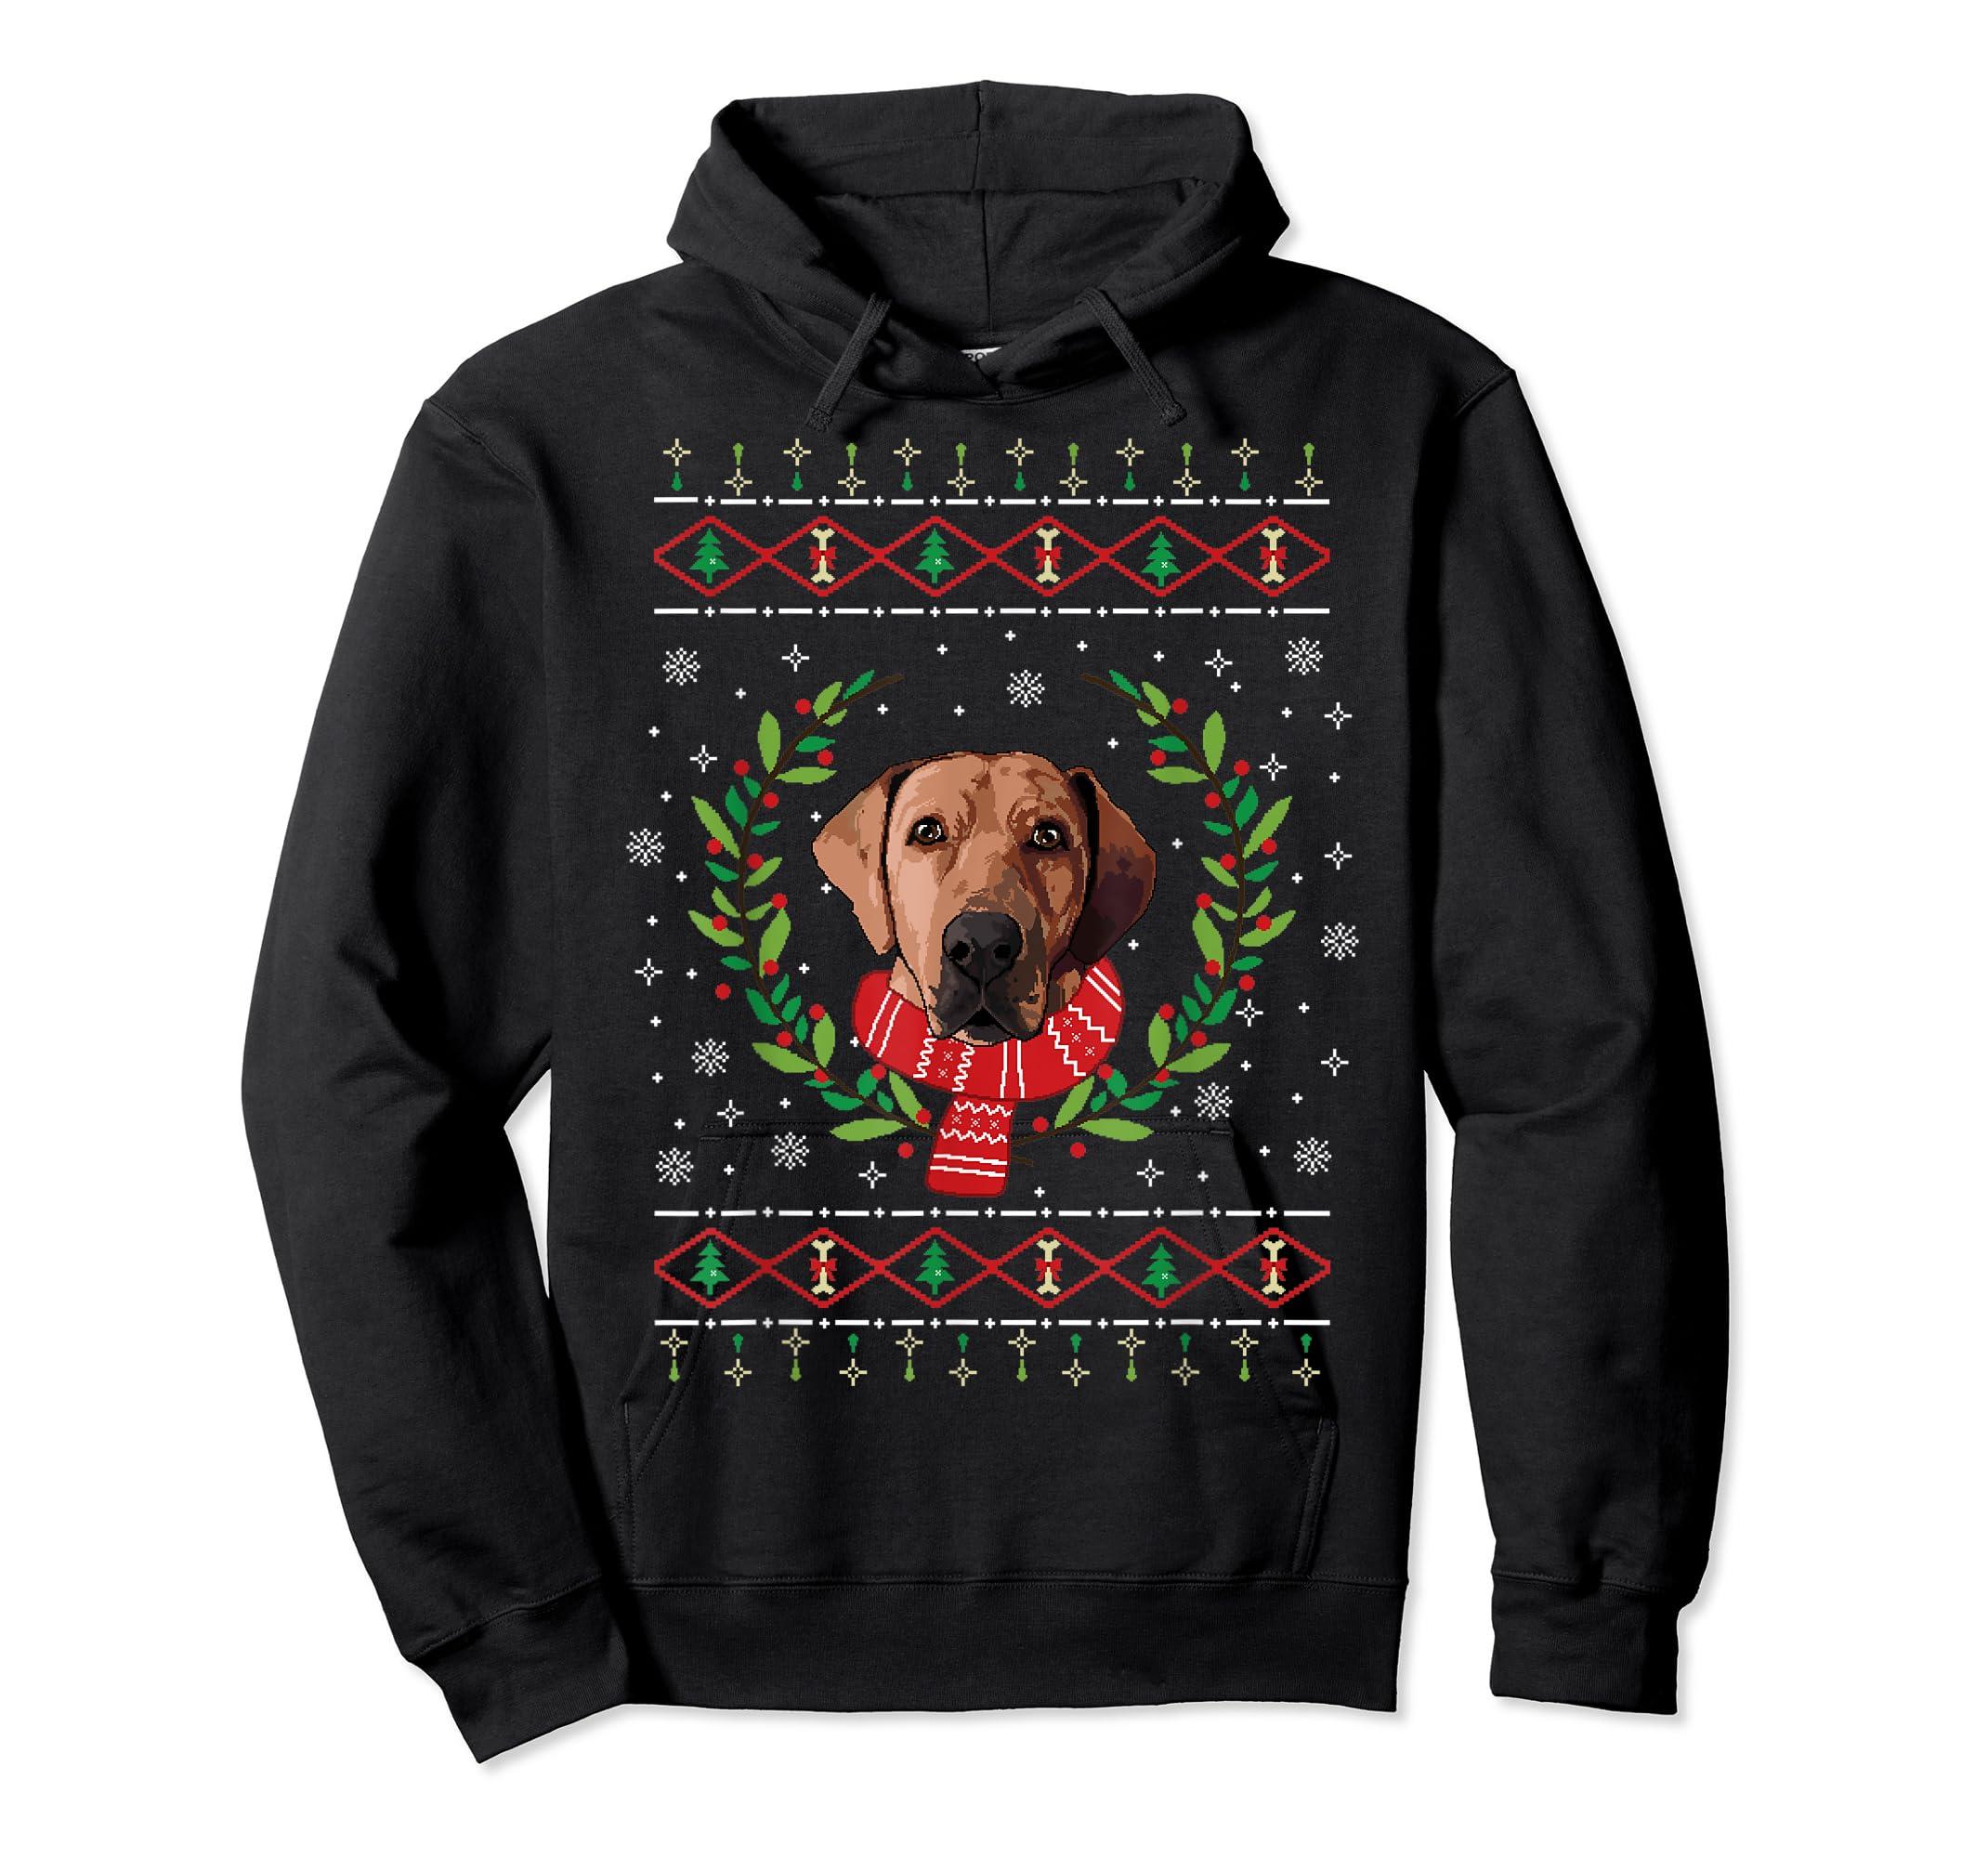 Broholmer Ugly Christmas Jumper T-Shirt Gift T-Shirt-Hoodie-Black